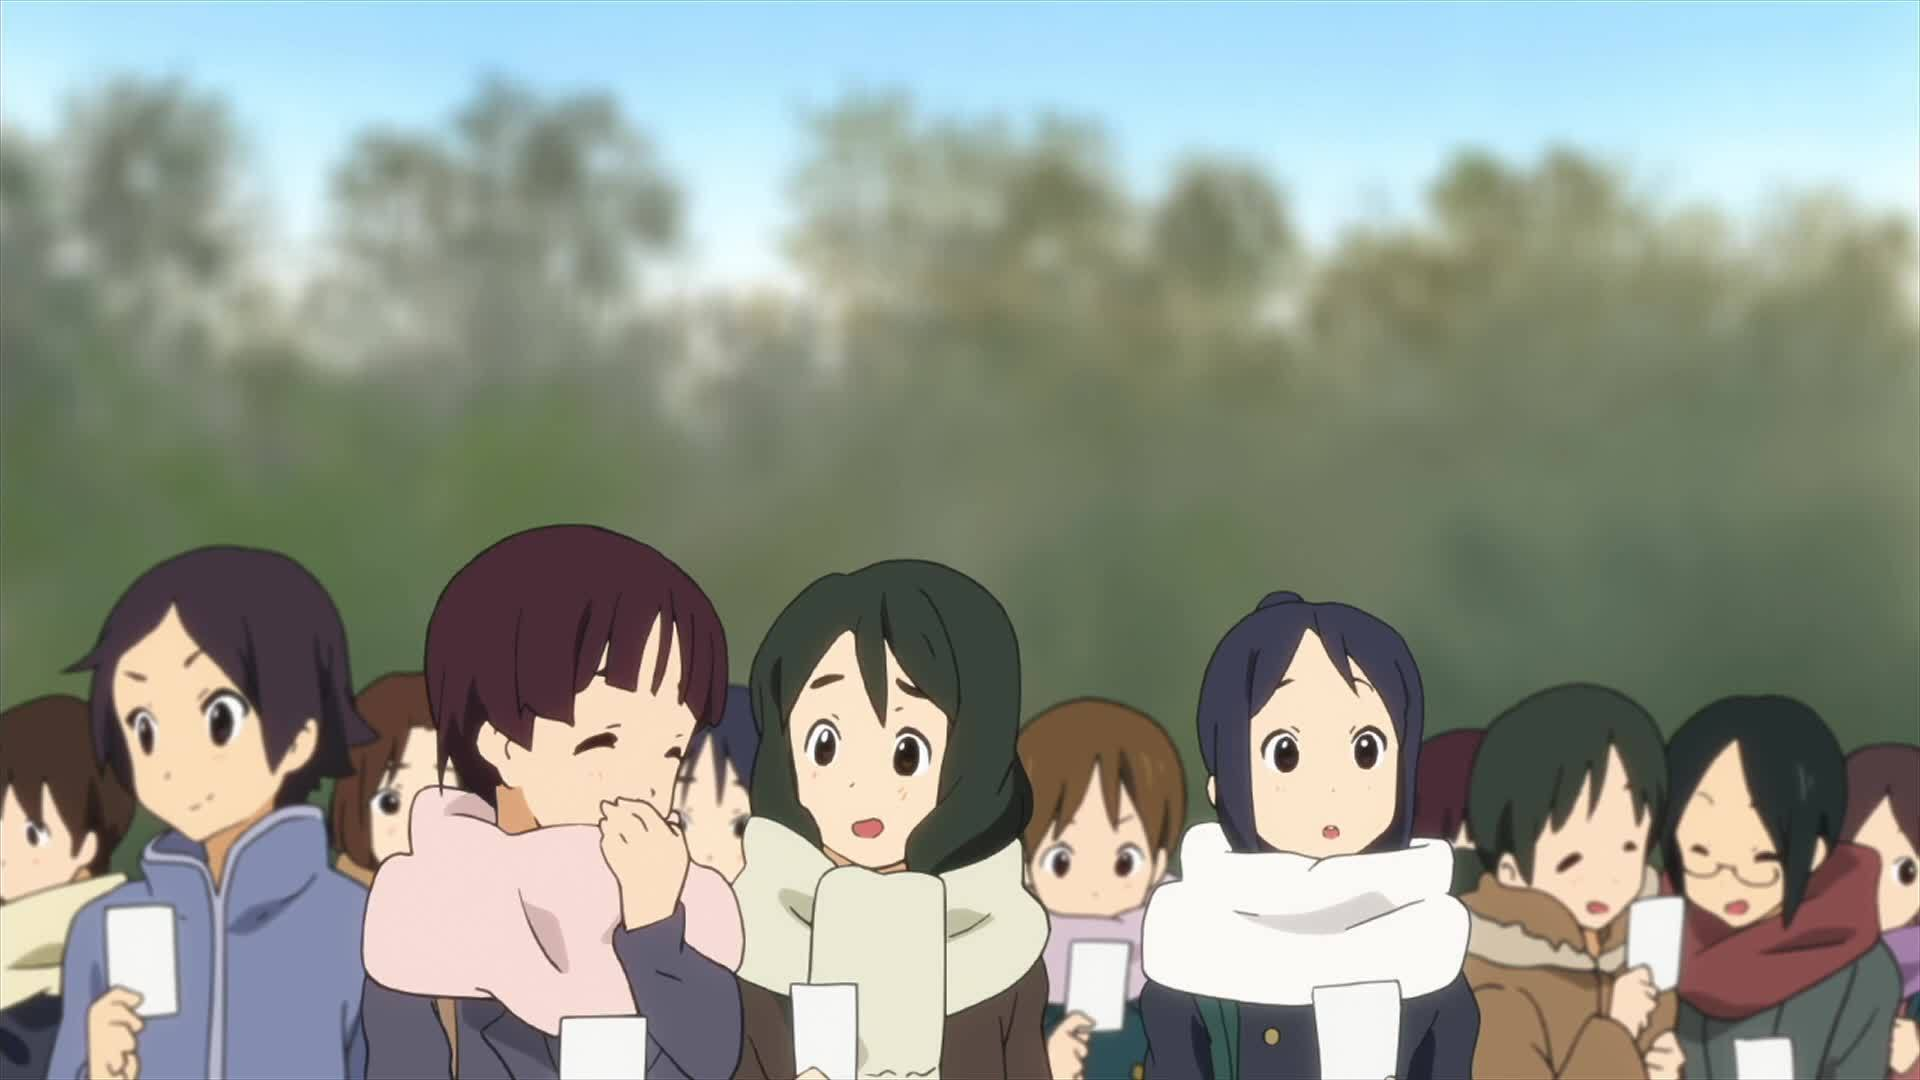 Anime, K-ON!!, K-ON!! GIFs